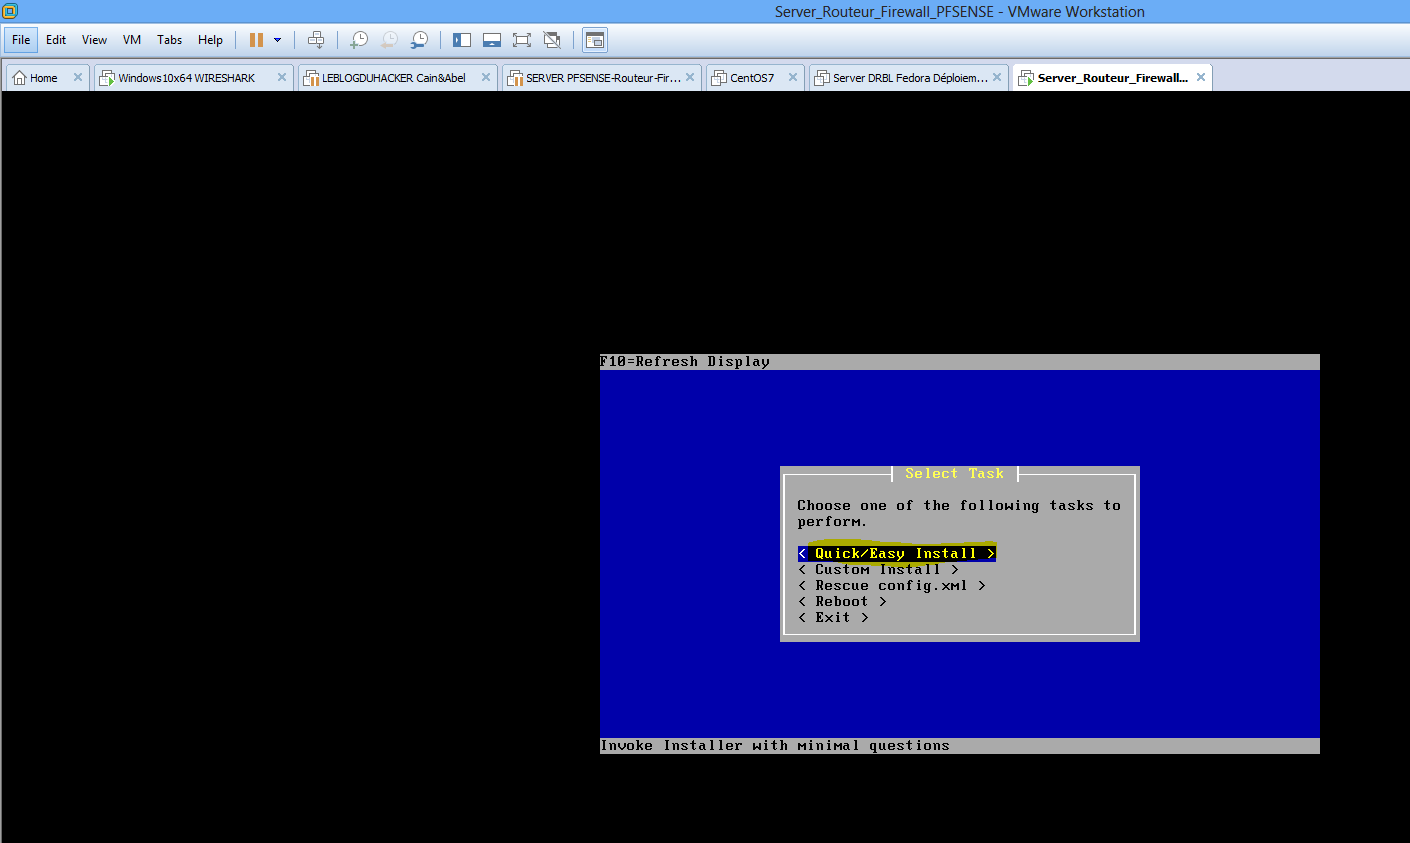 Capture Valider installation rapide Quick Easy Intall